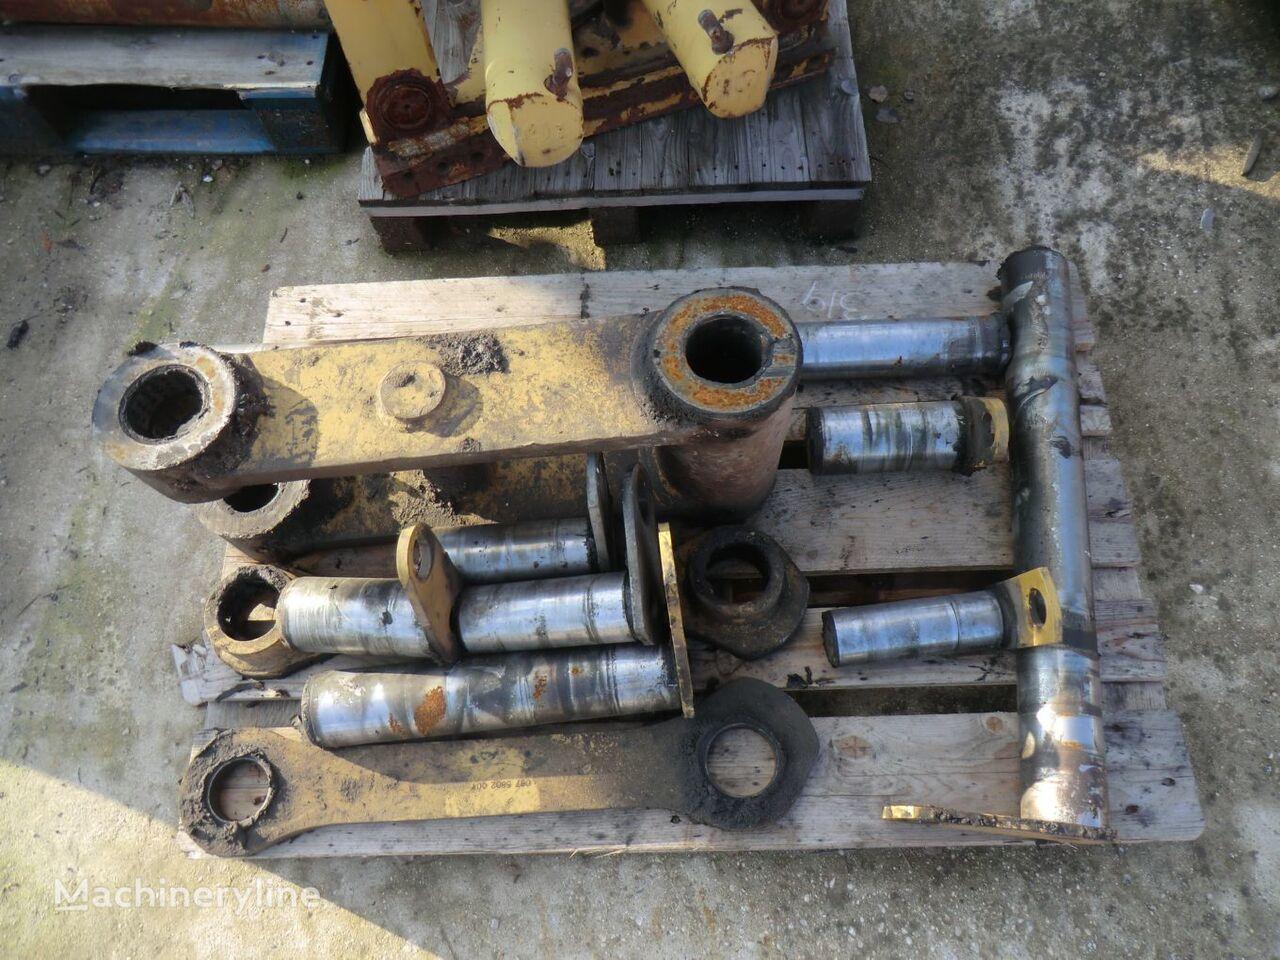 LINKAGE GP fasteners for CATERPILLAR 319C NL KGL00643 excavator